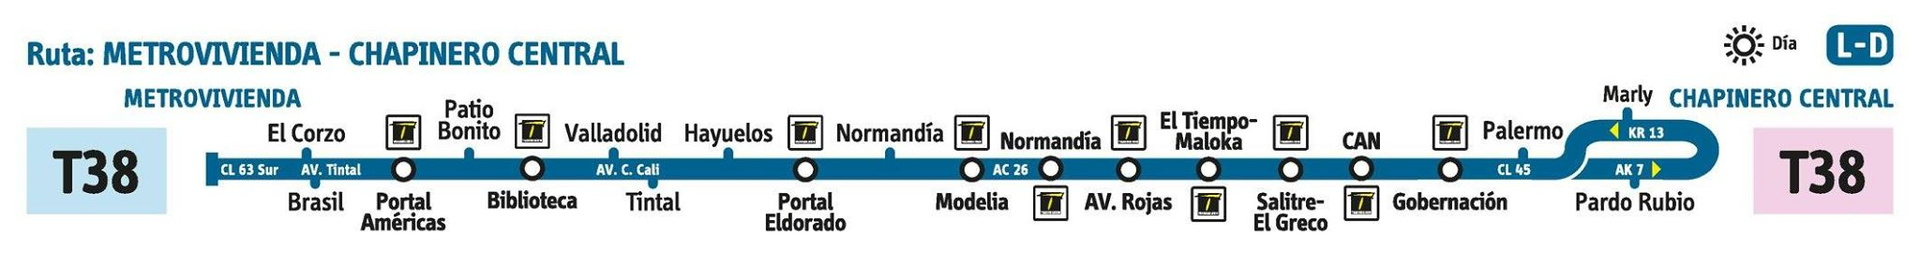 Ruta SITP: T38 Metrovivienda ↔ Chapinero Central [Urbana] 1